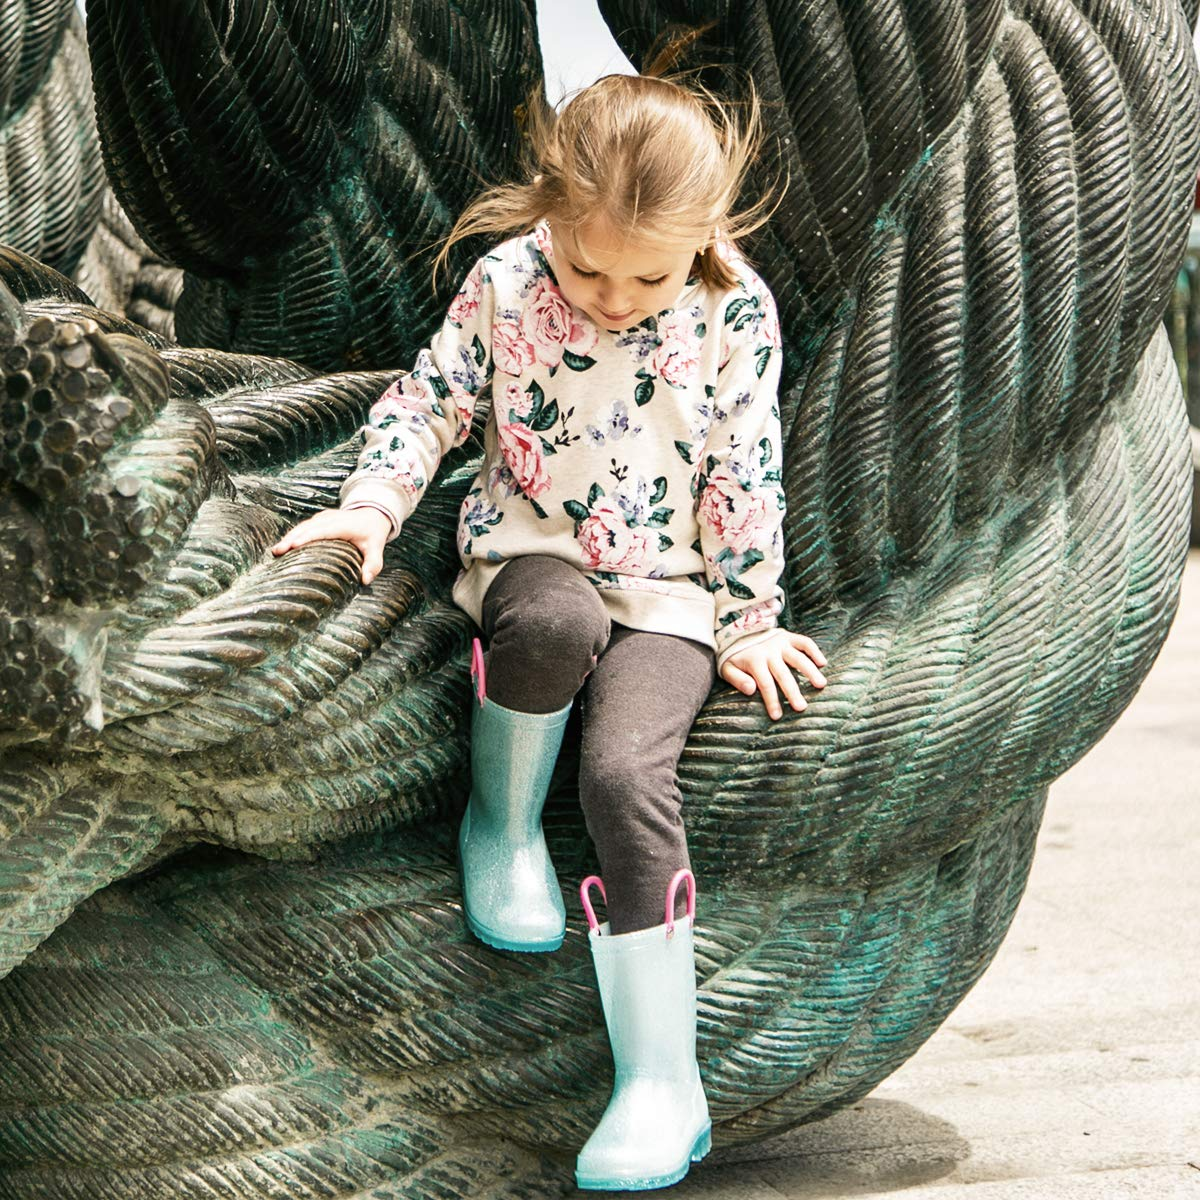 KomForme RPGL054-1M K Light Up Kids Rain Boots Glitter Girl Boots Blue by KomForme (Image #7)